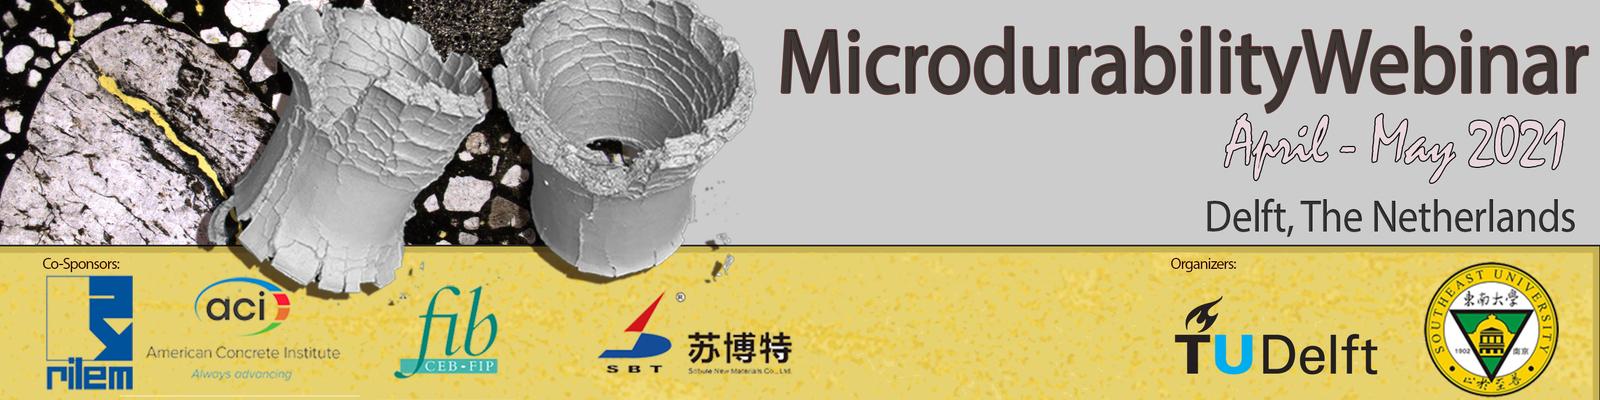 Microdurability 2021